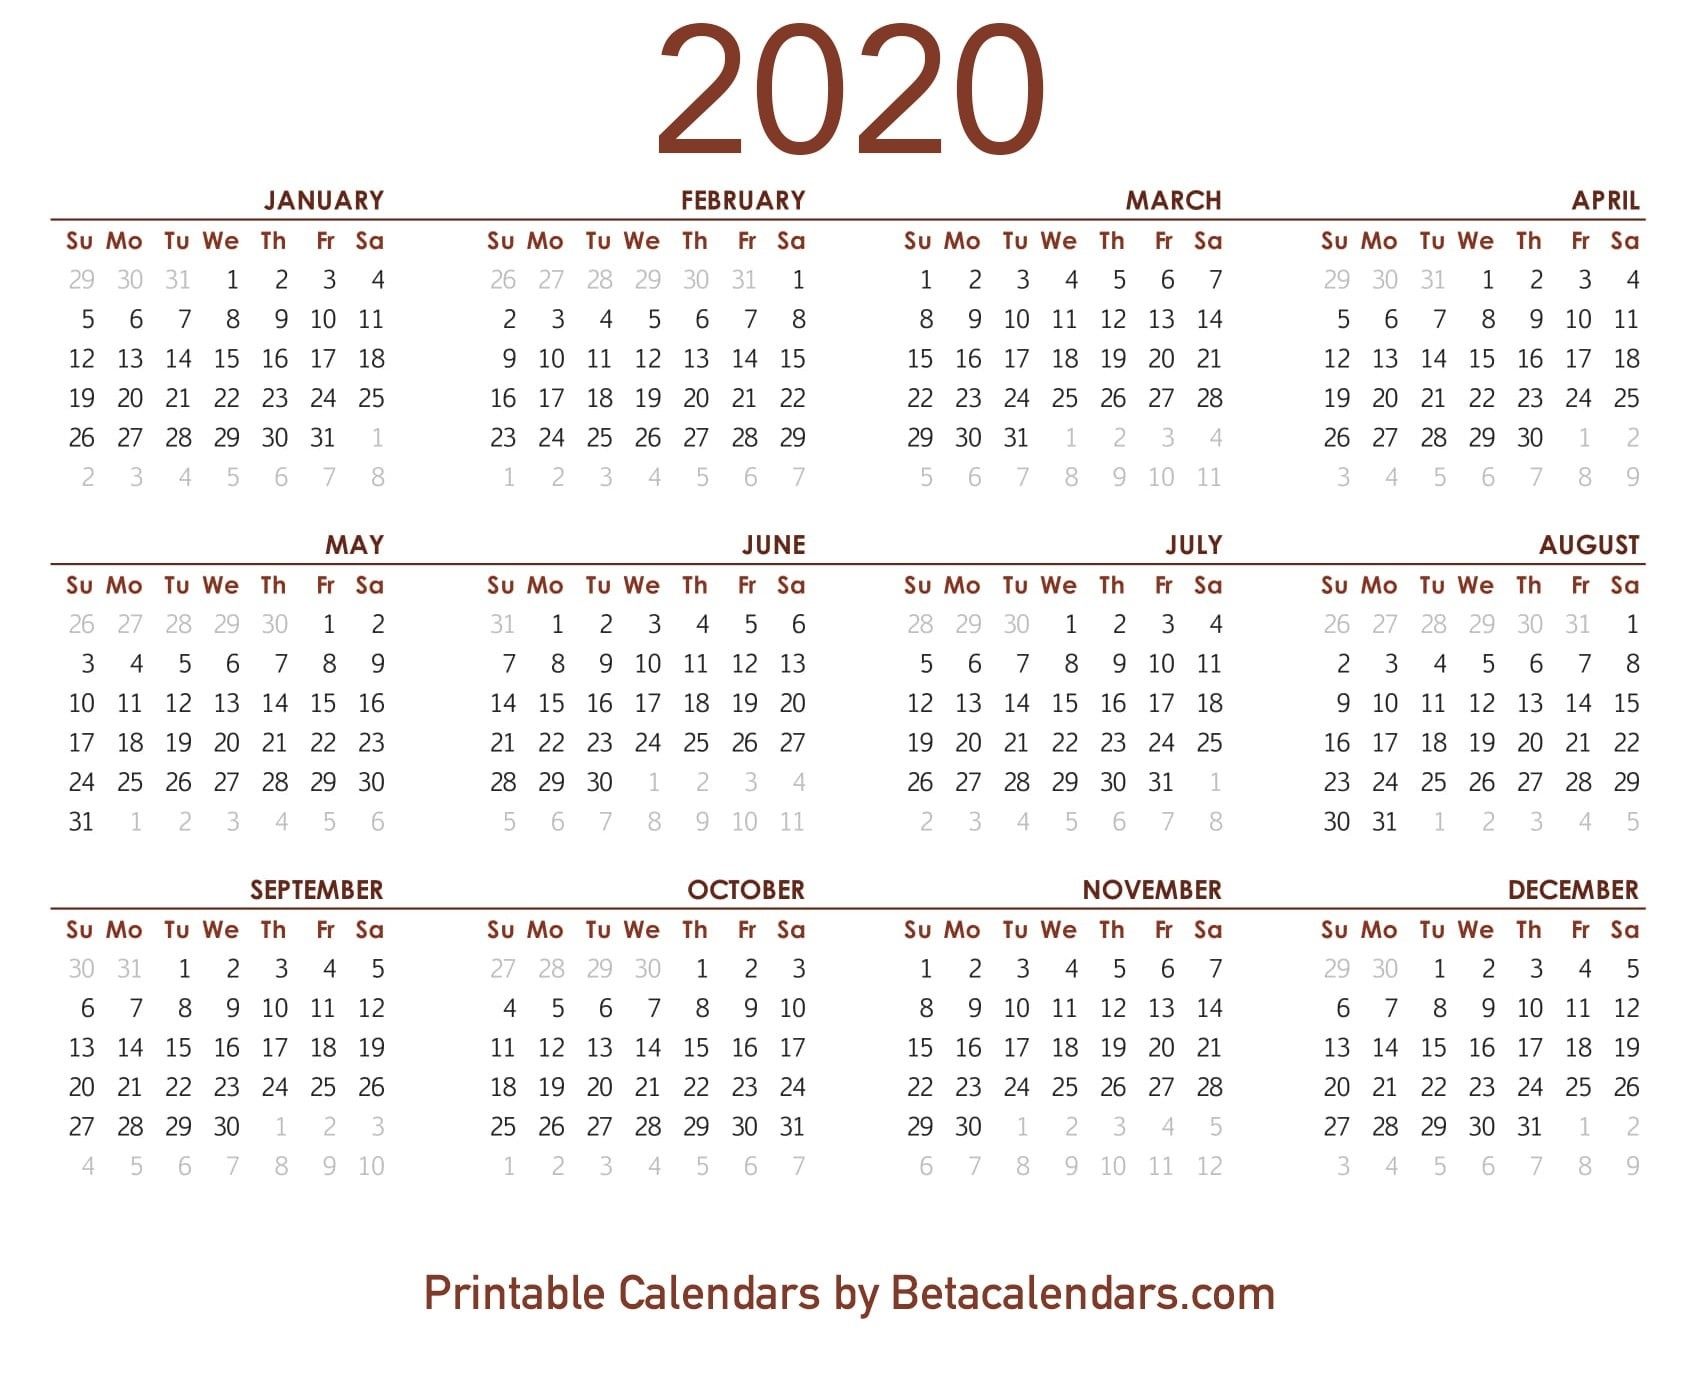 2020 Calendar - Free Printable Yearly Calendar 2020  Year 2020 Calendar Printable